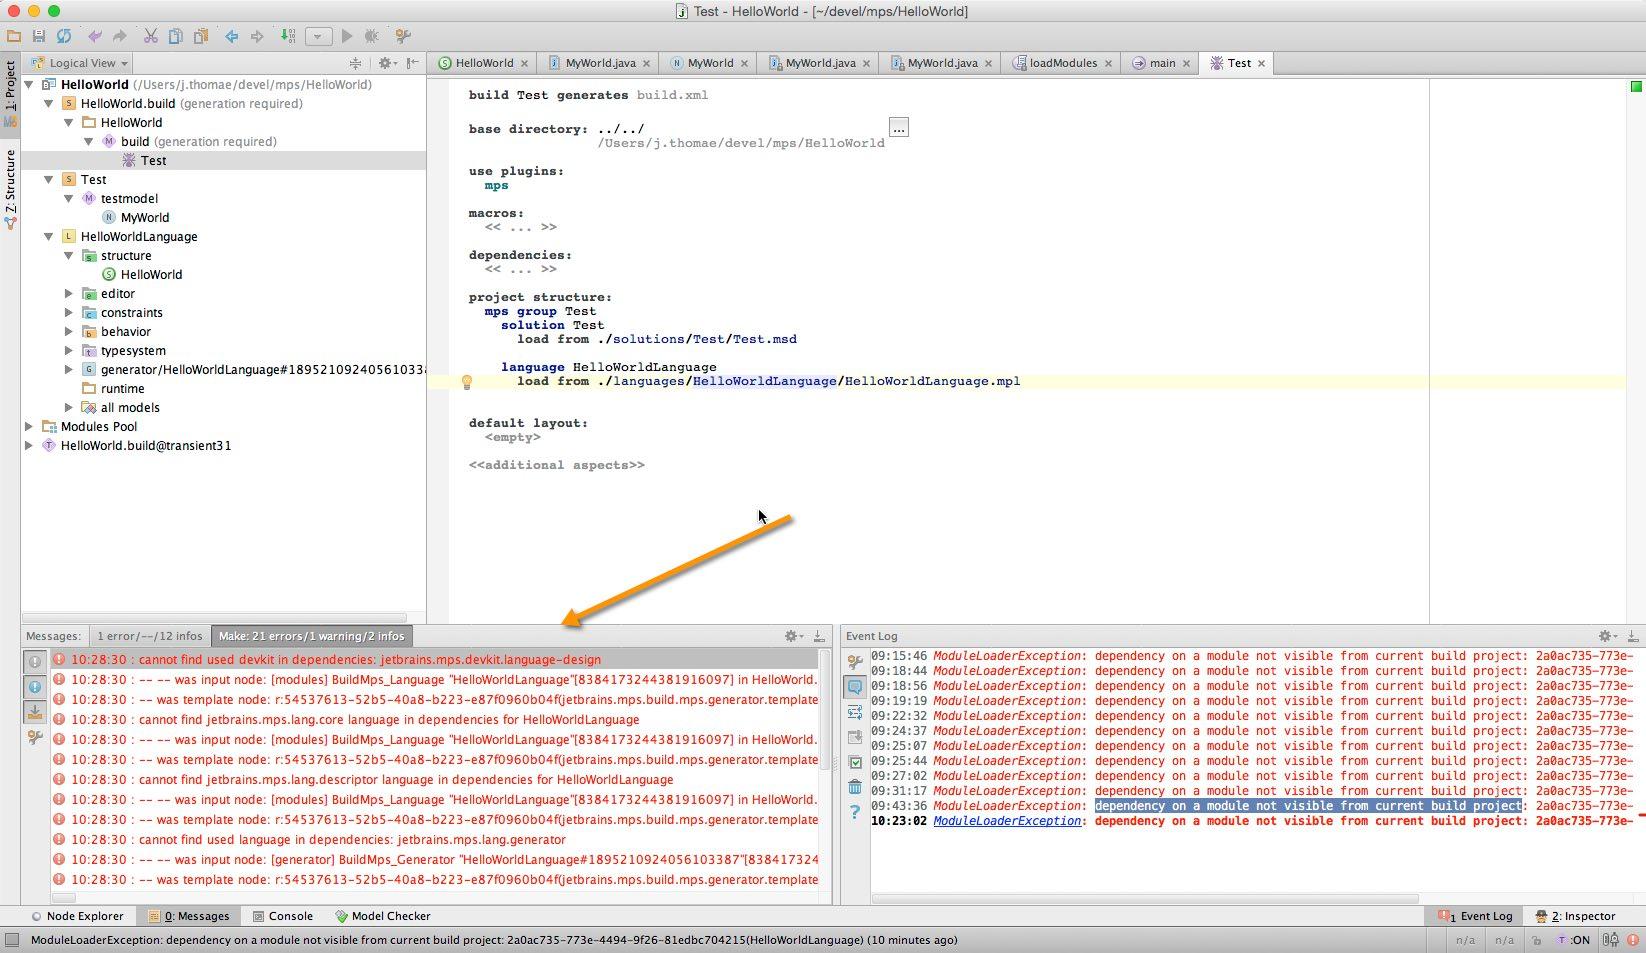 errors_when_building.jpg